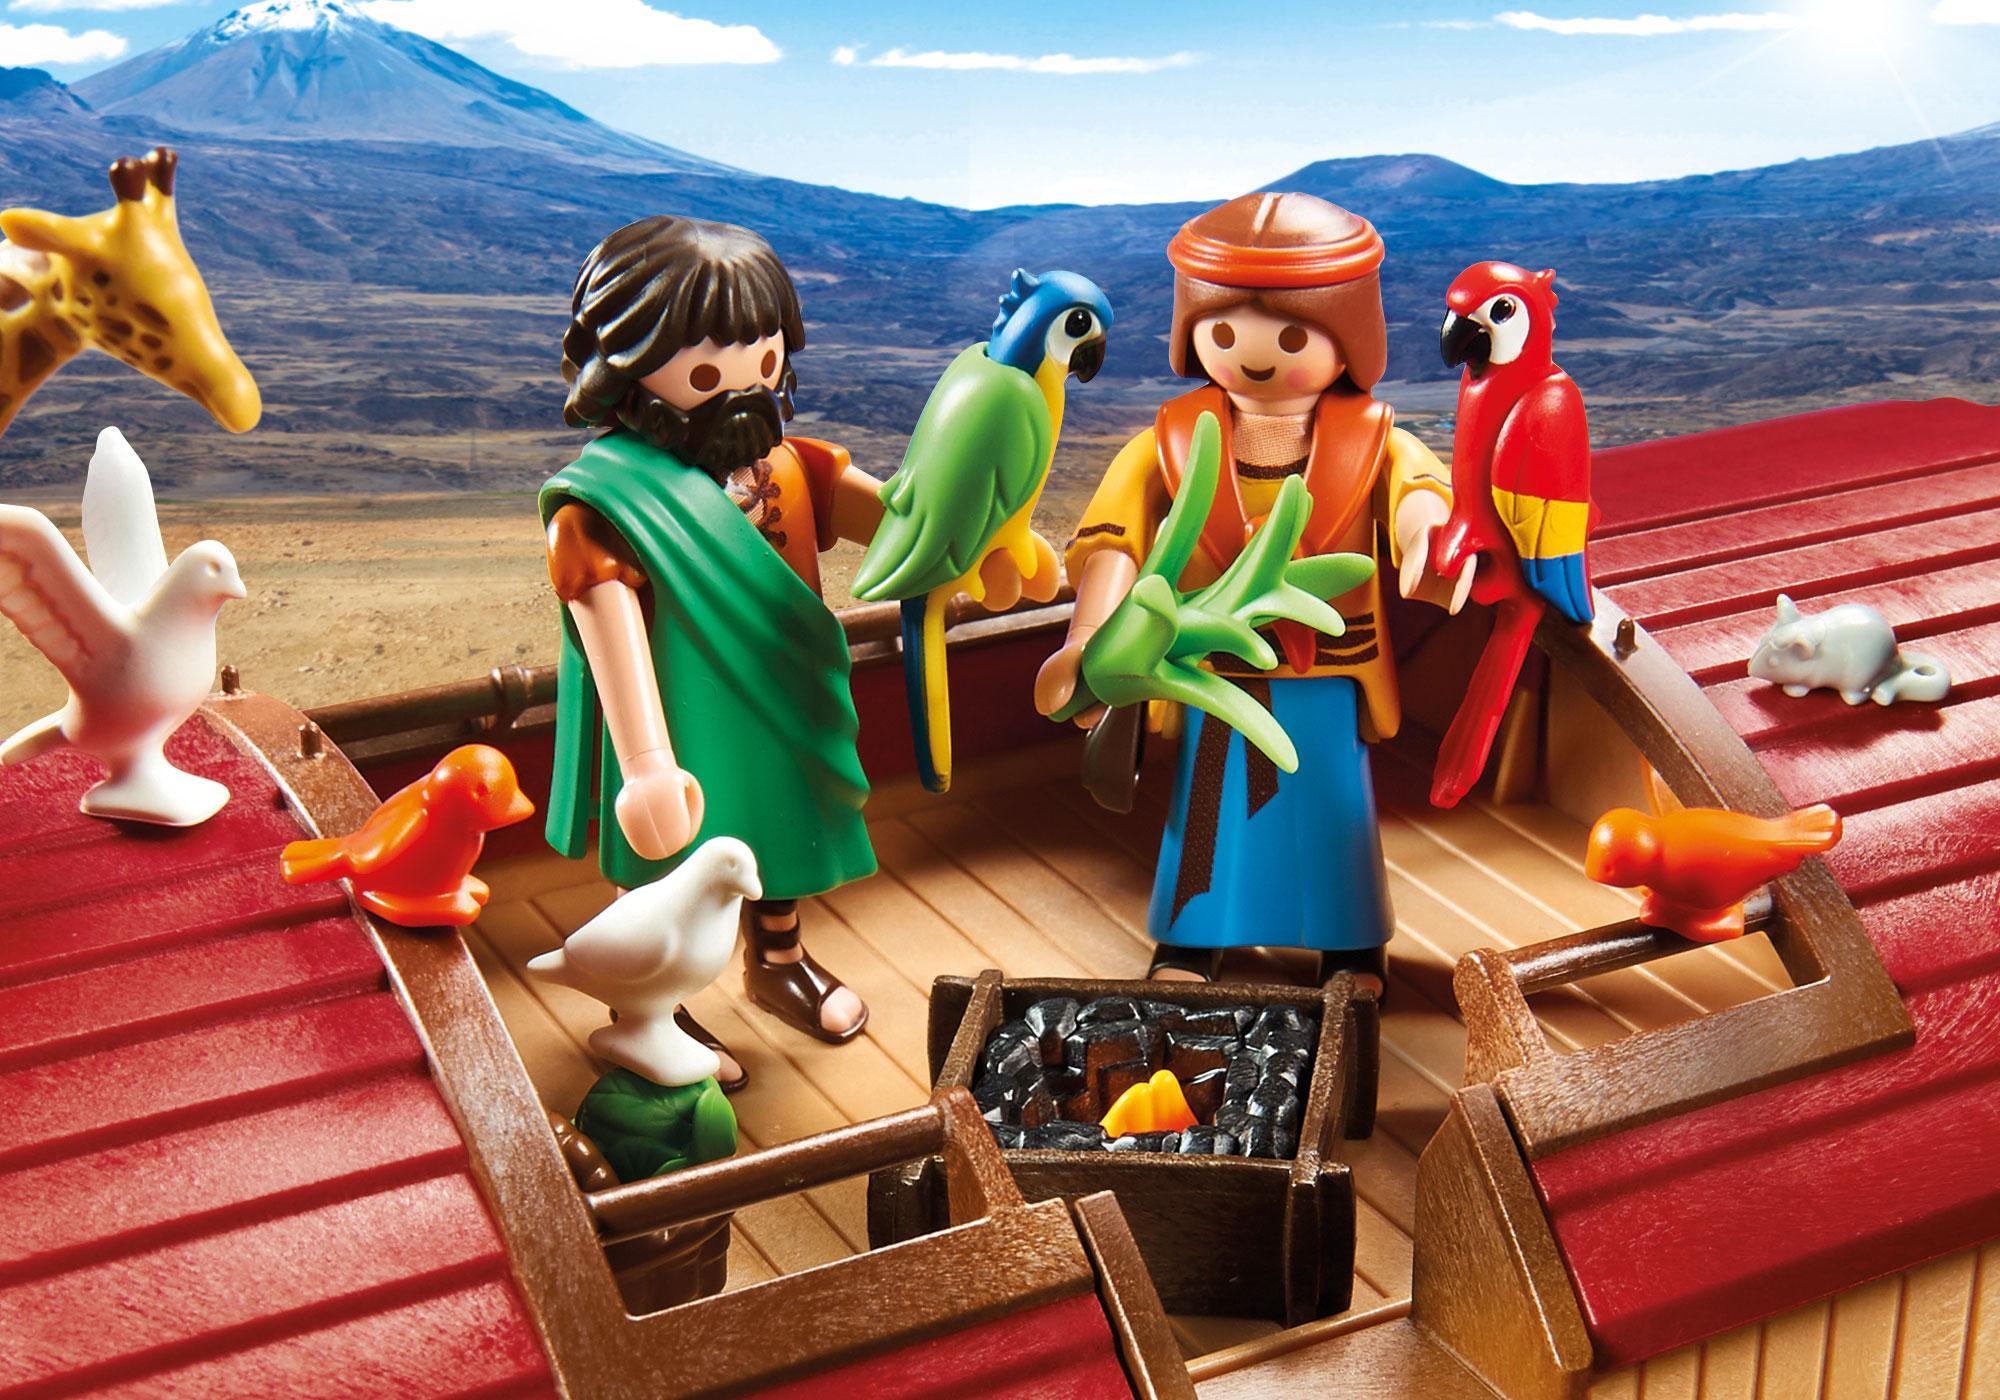 http://media.playmobil.com/i/playmobil/9373_product_extra1/Arche Noah